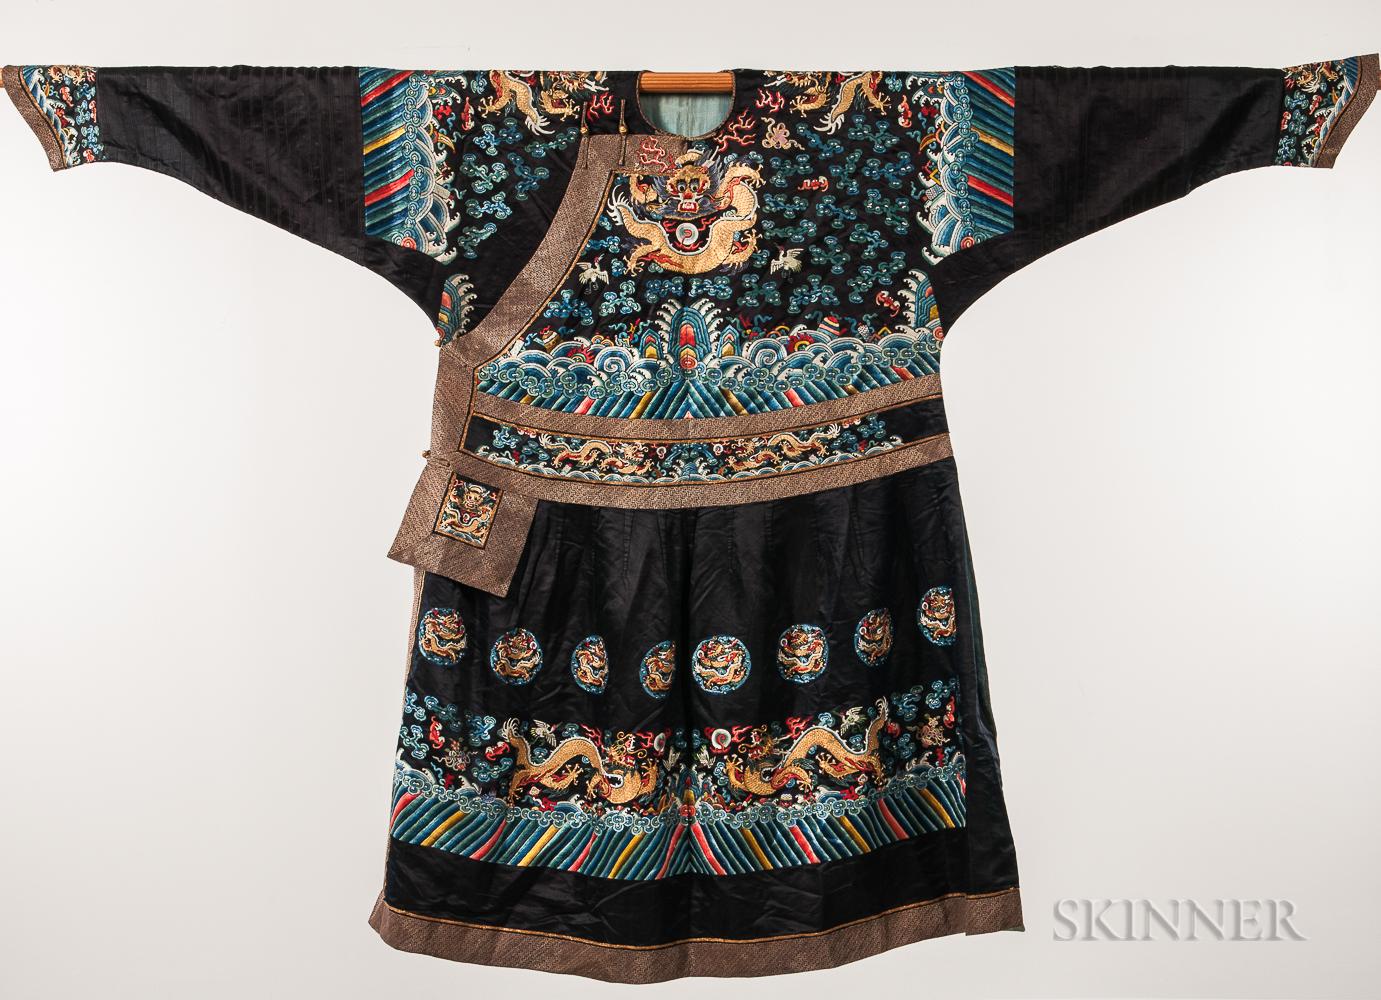 Man's Formal Court Robe